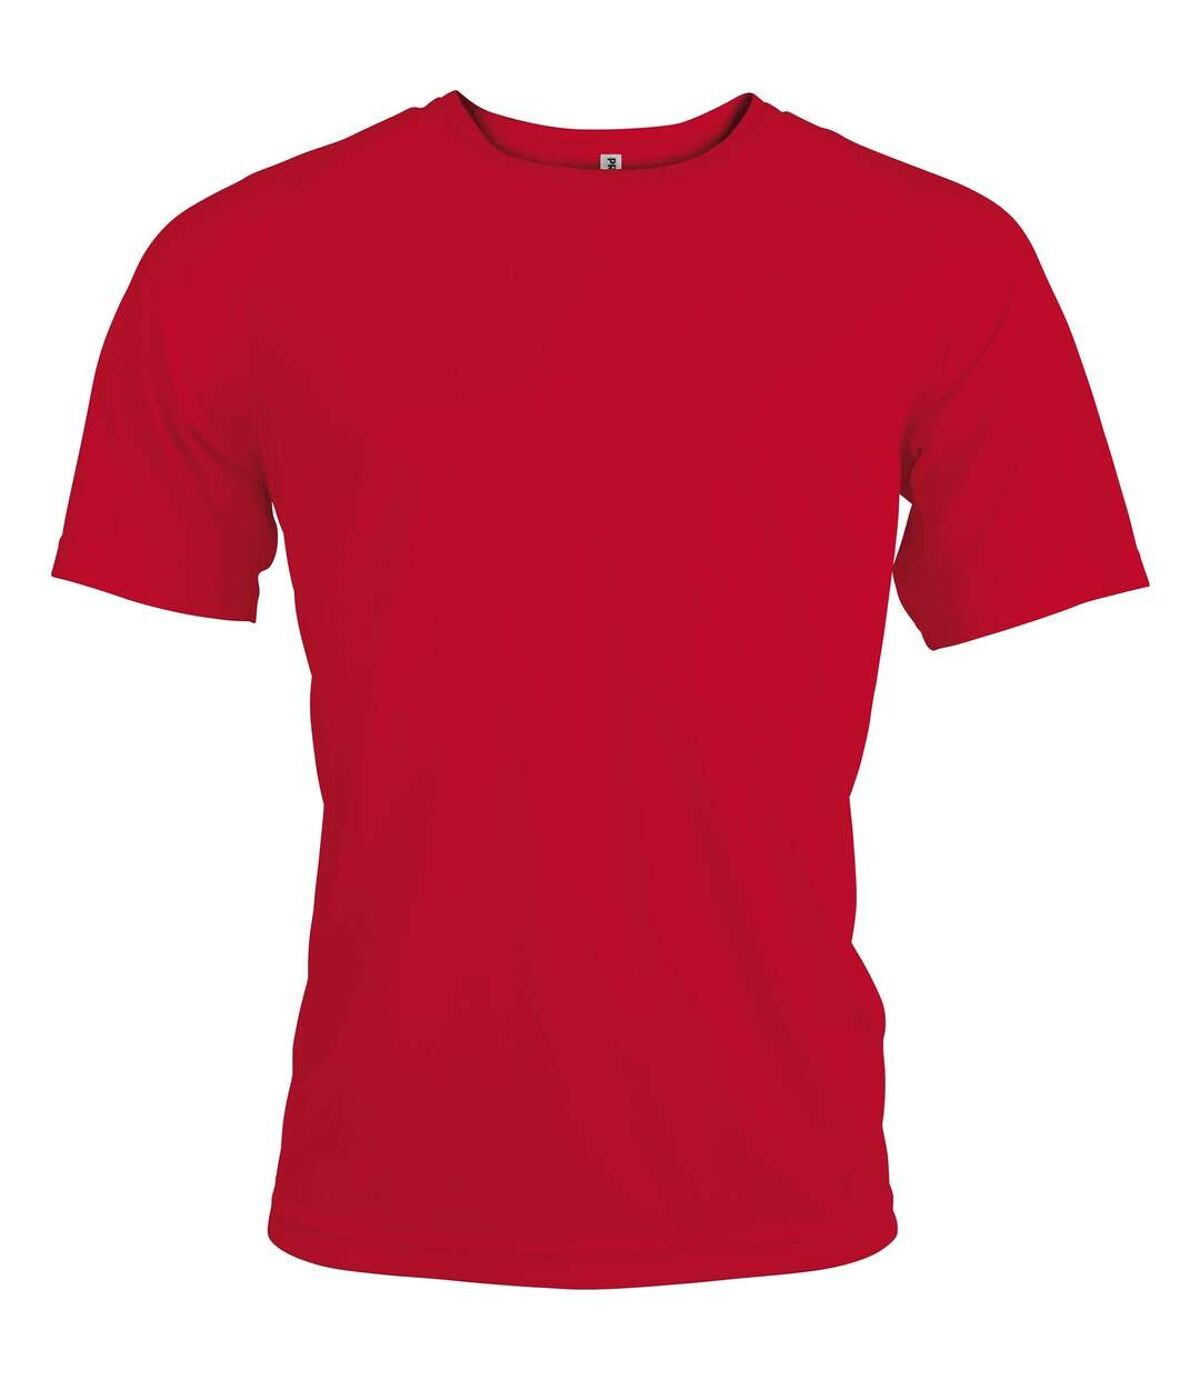 Kariban Mens Proact Sports / Training T-Shirt (Fluorescent Yellow) - UTRW2717